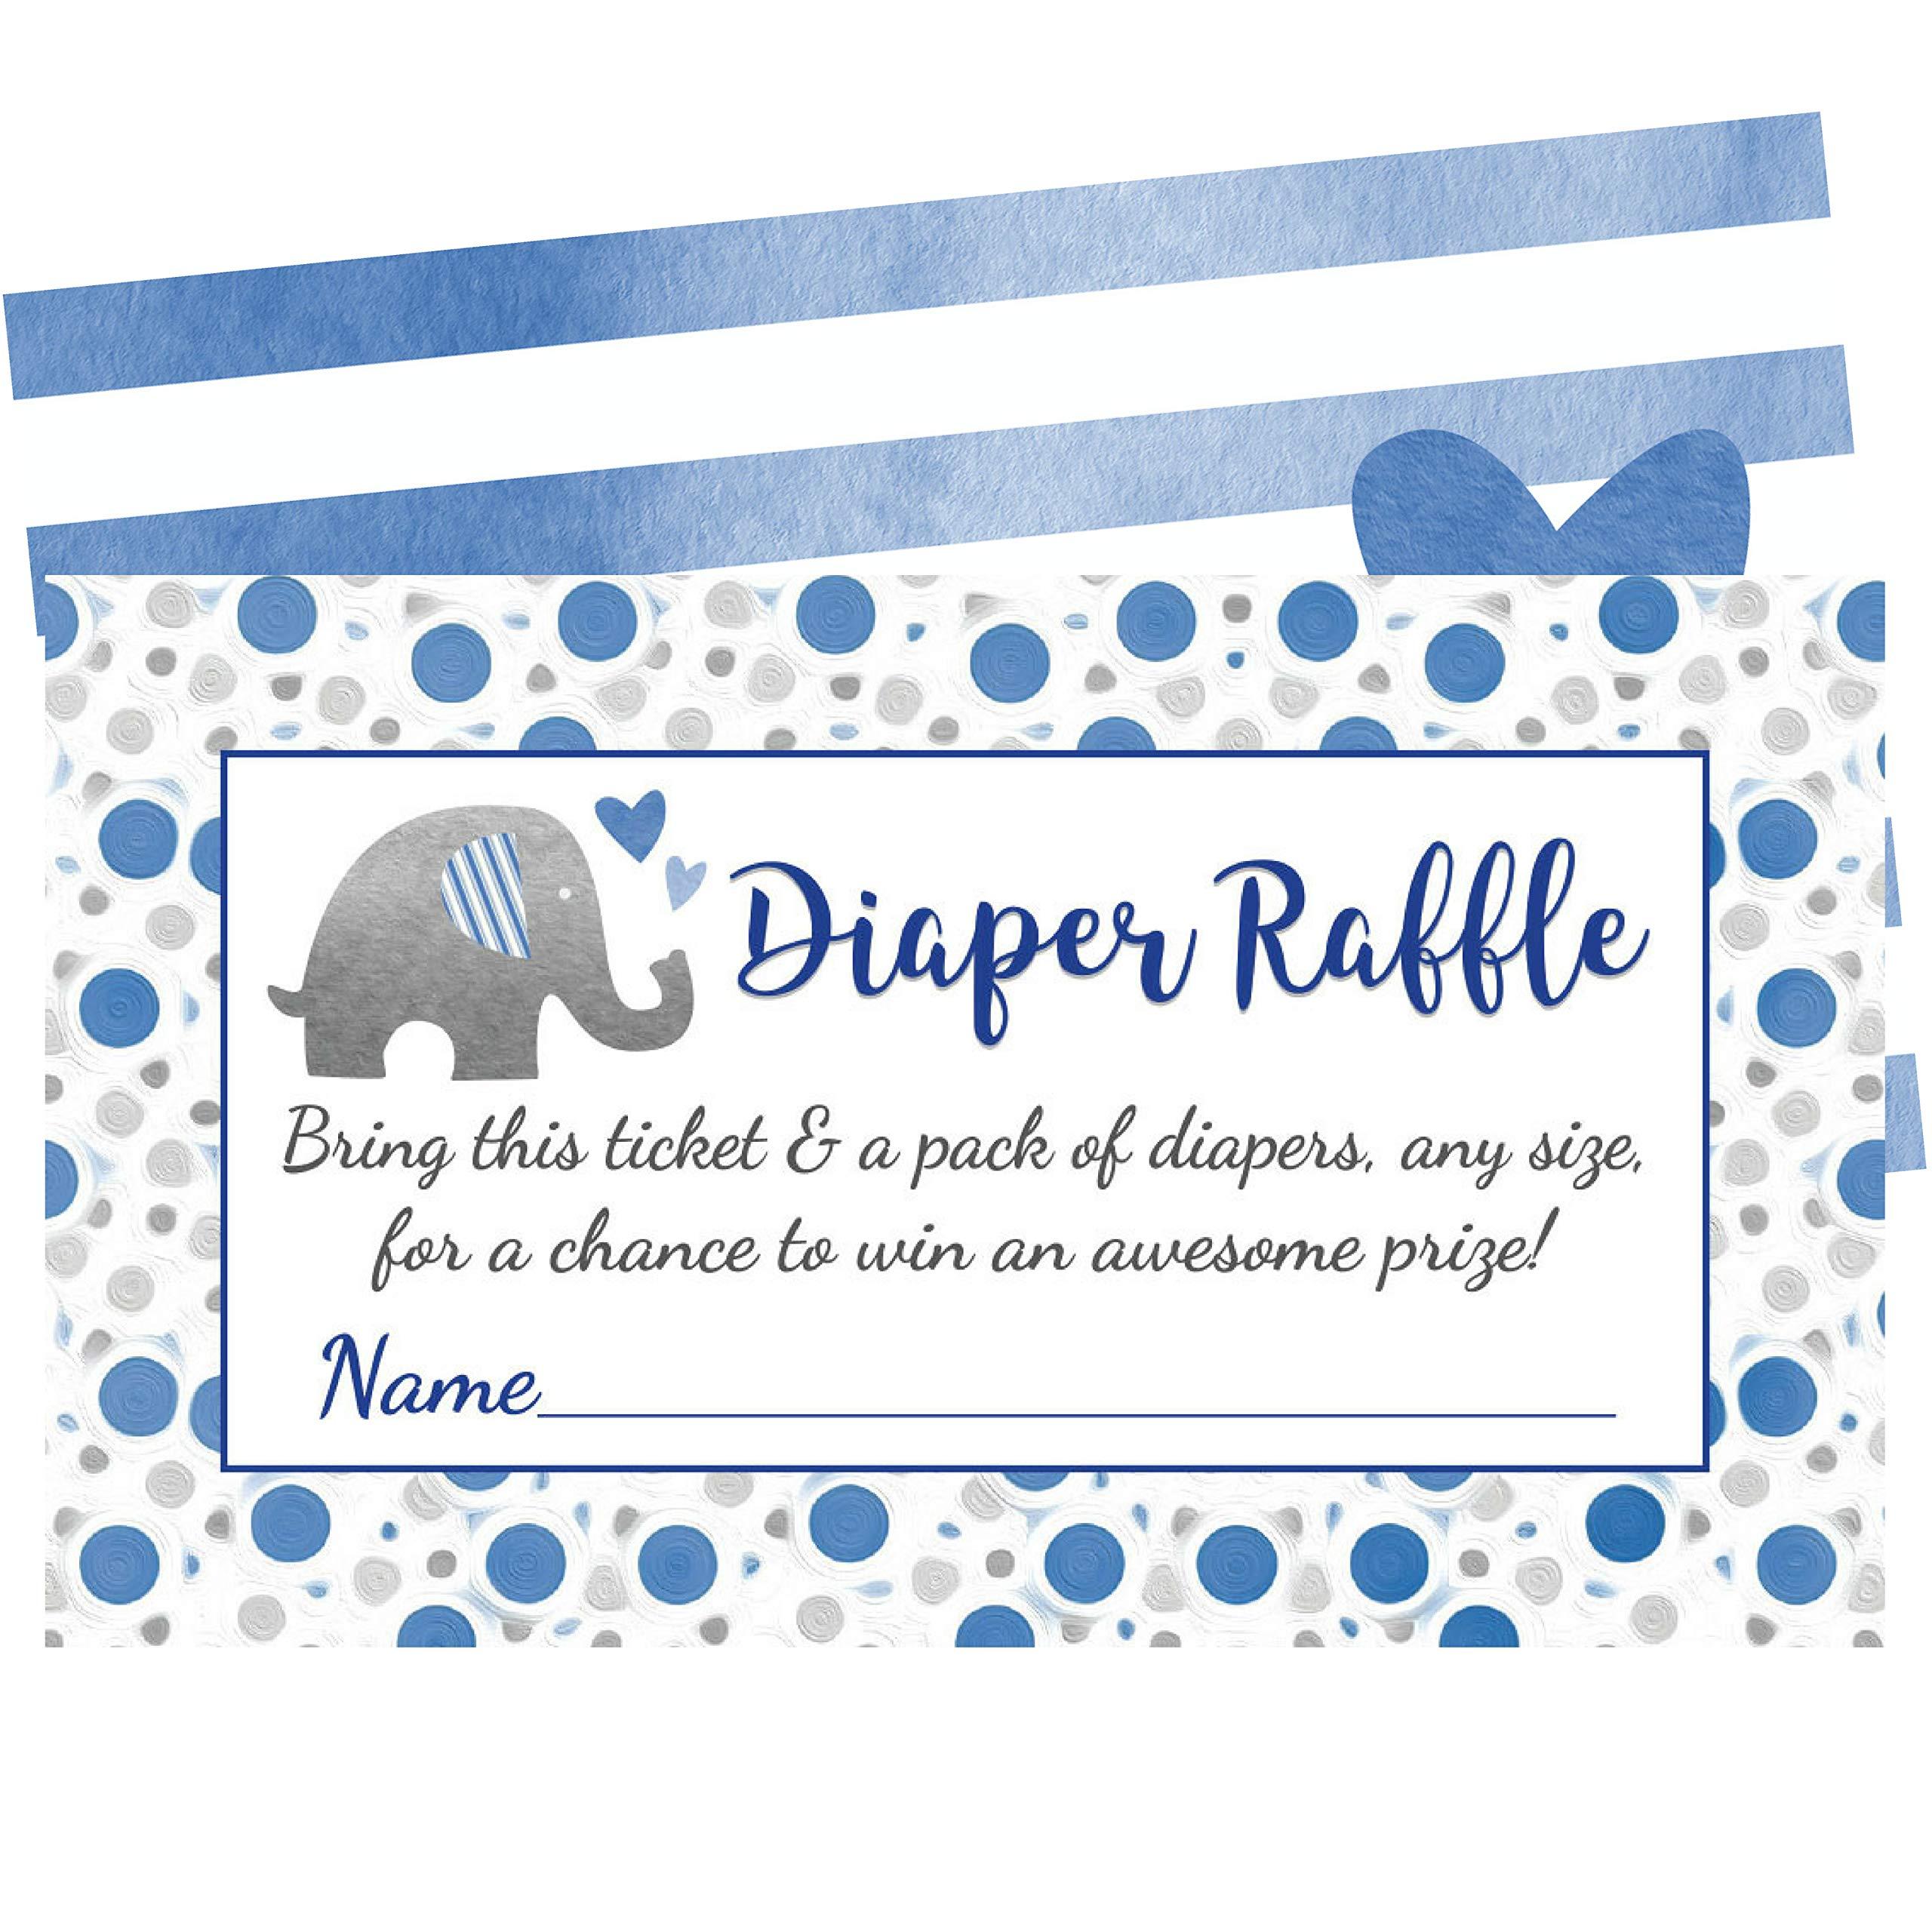 Blue Elephant Diaper Raffle Tickets - 50 Cards for Fun Boy Baby Shower Games